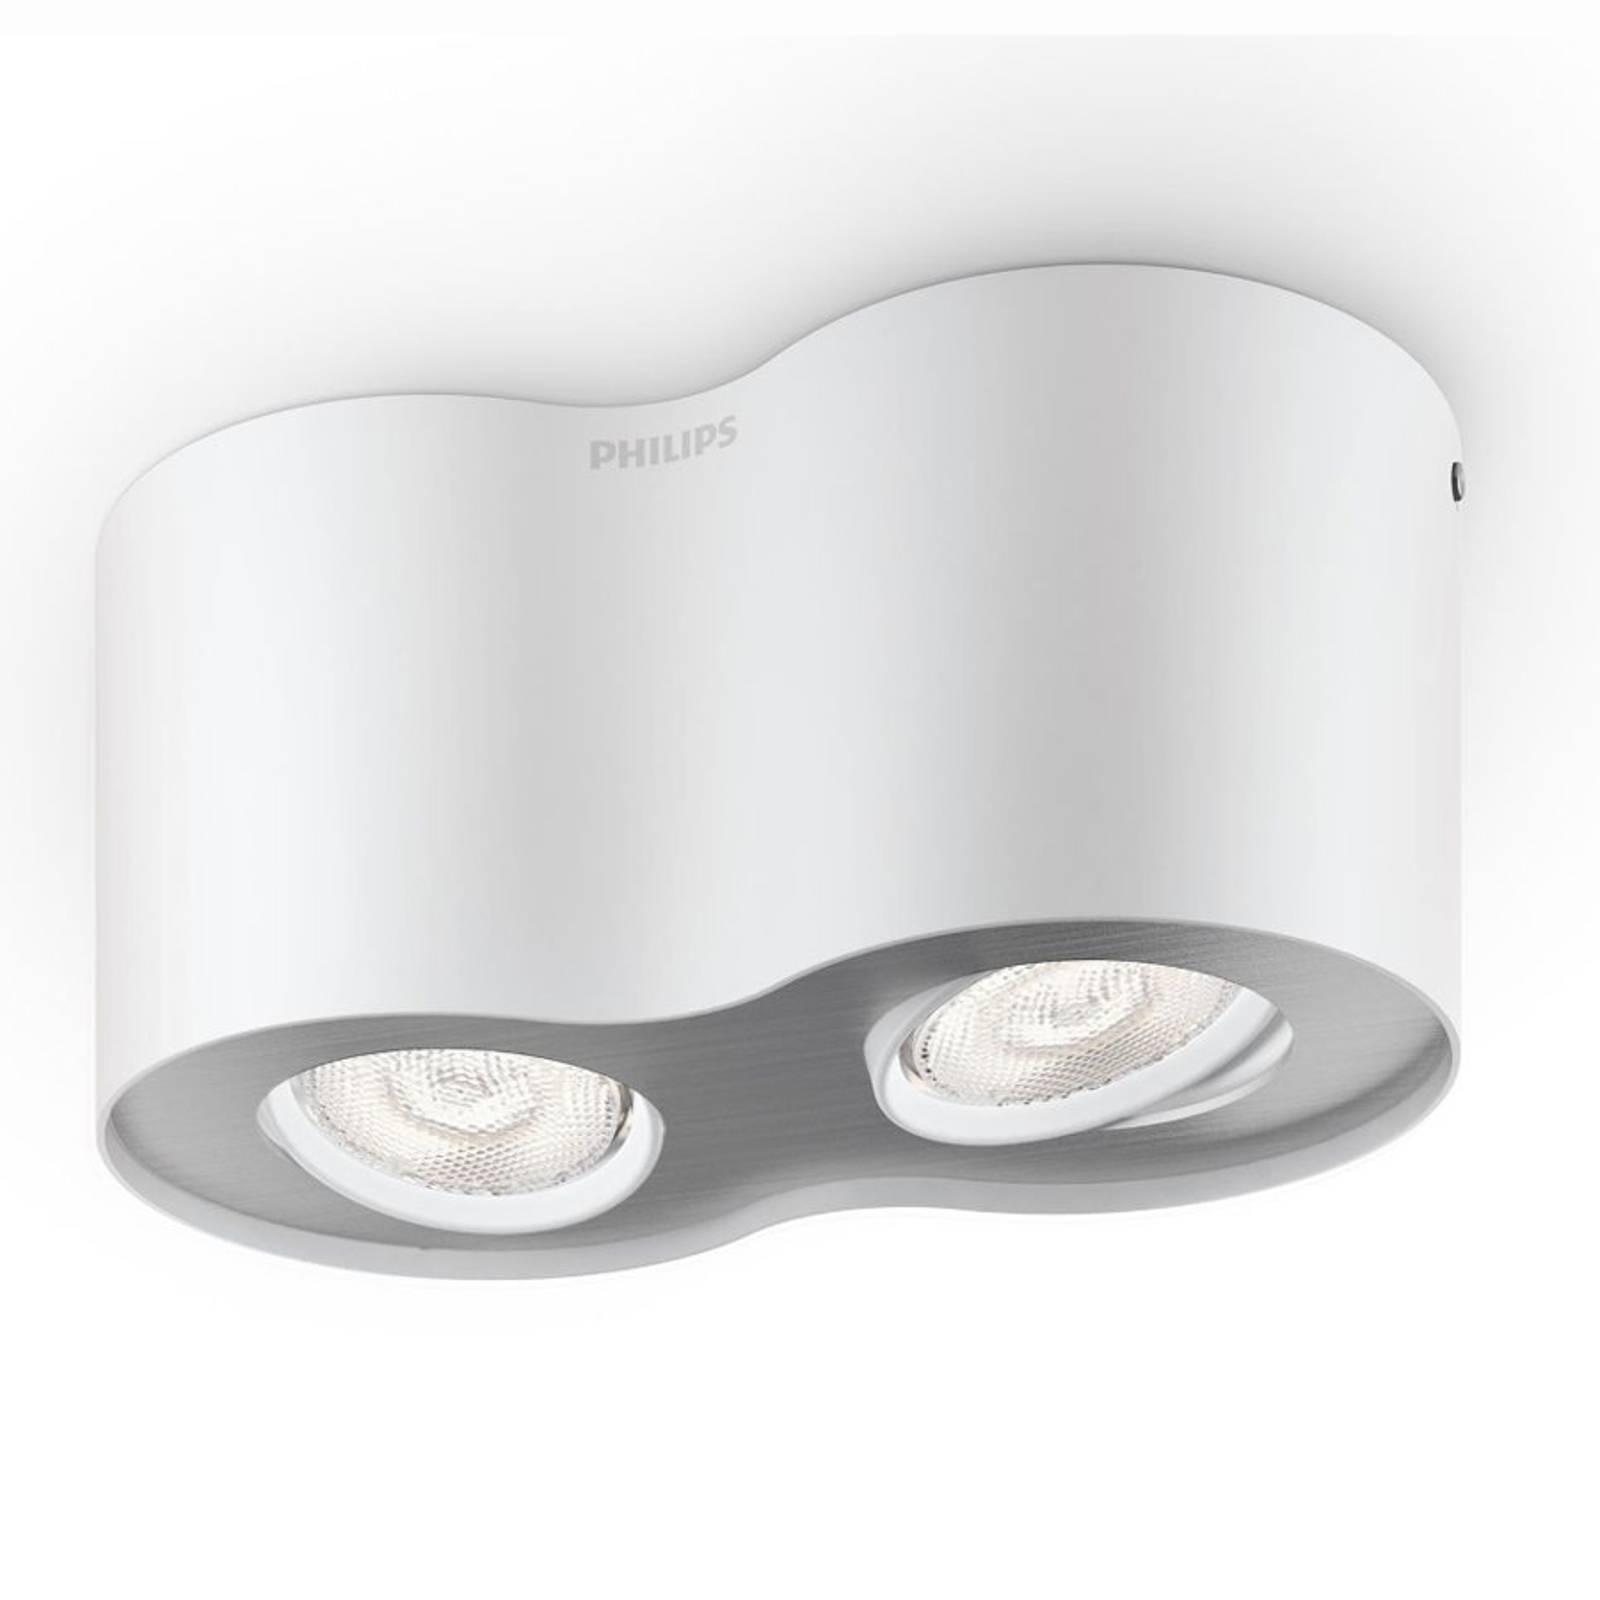 LED spot Phase in wit met twee lichtbronnen